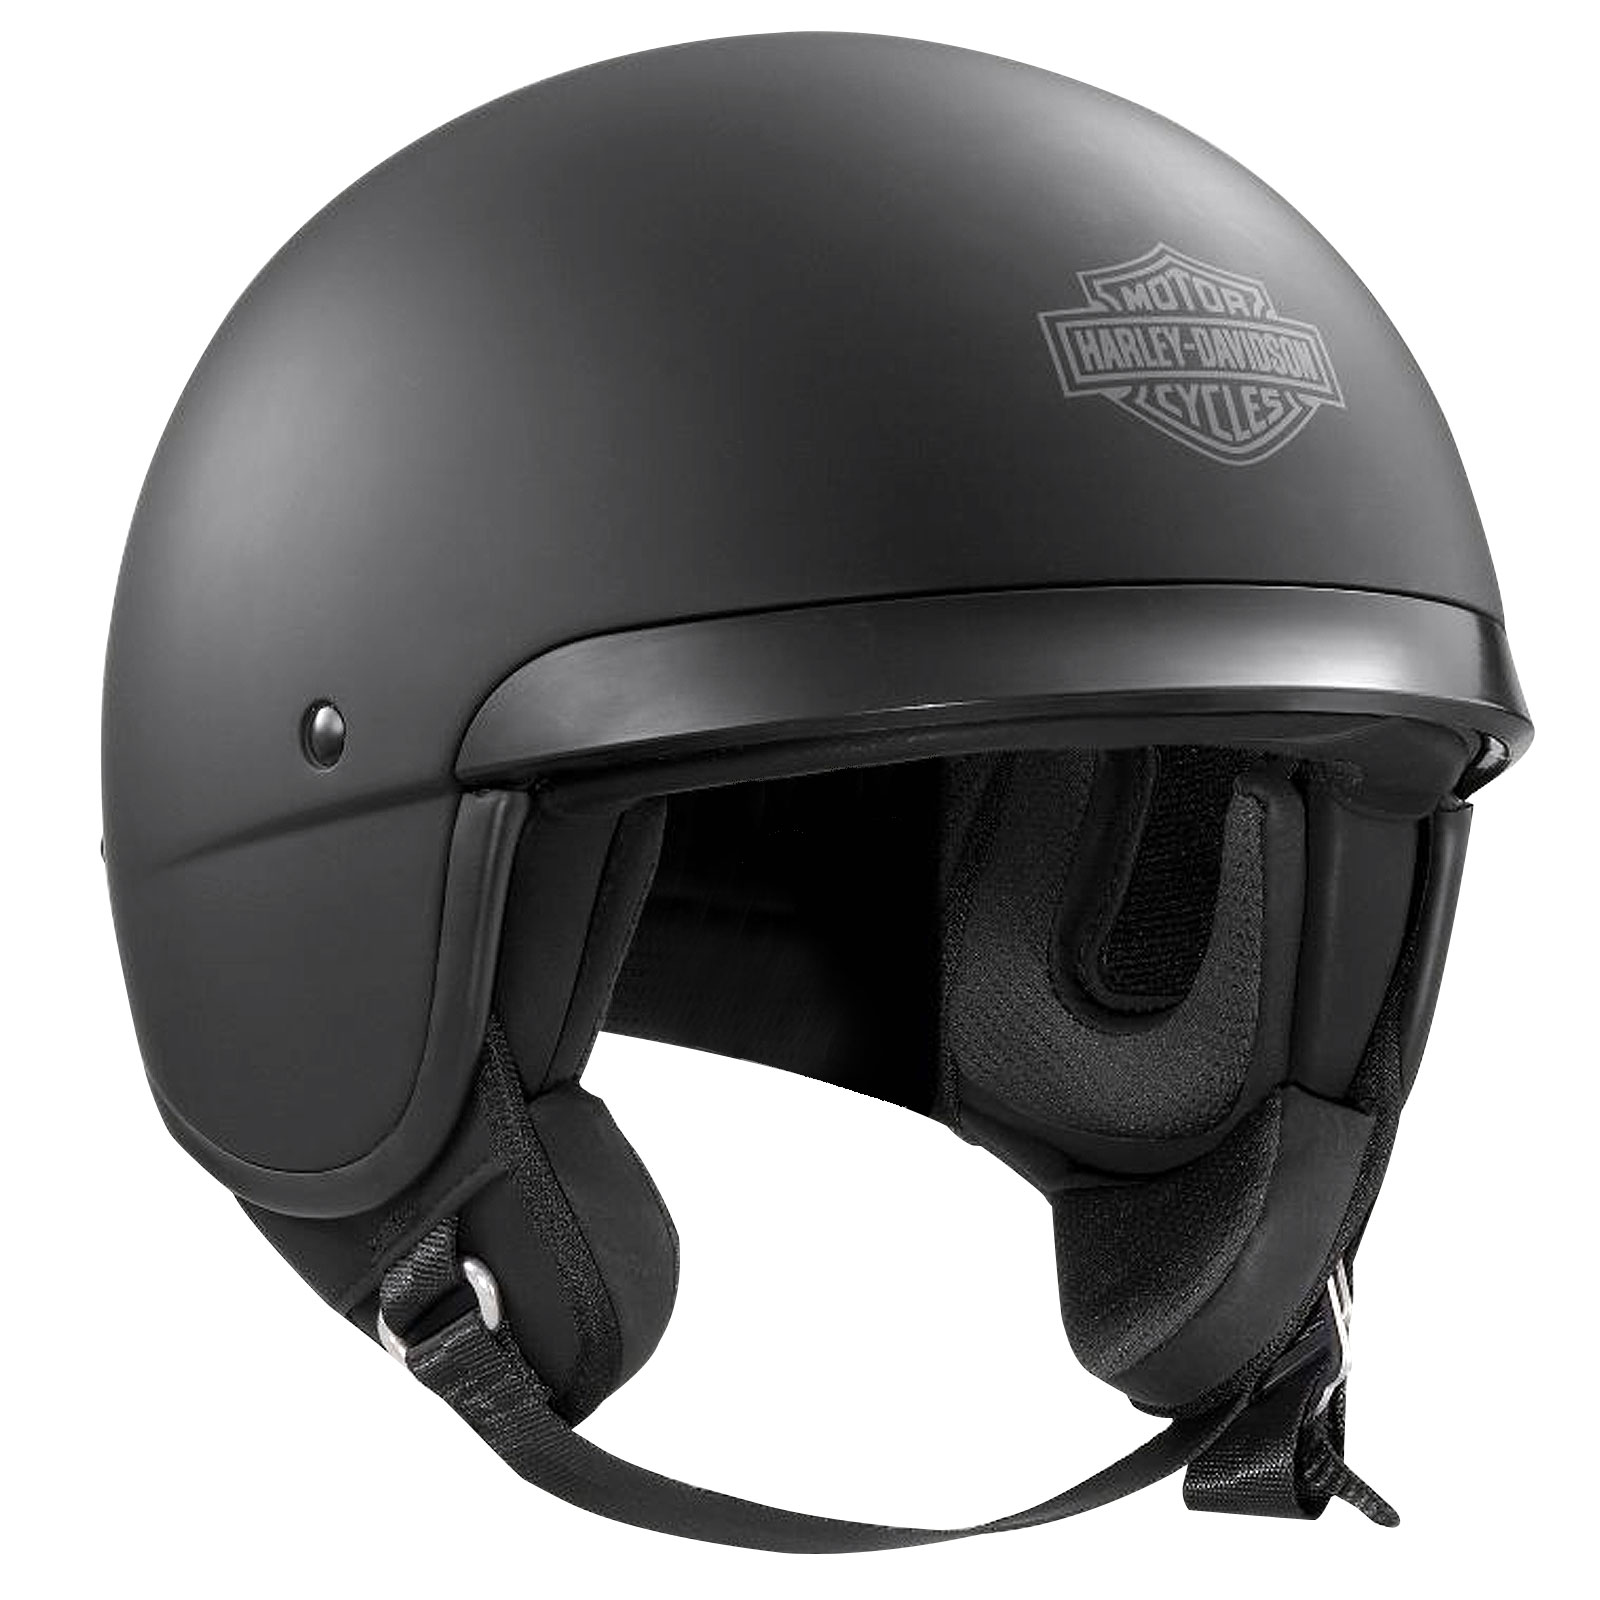 genuine harley davidson hightail b09 5 8 open face motorcycle helmet matt black ebay. Black Bedroom Furniture Sets. Home Design Ideas